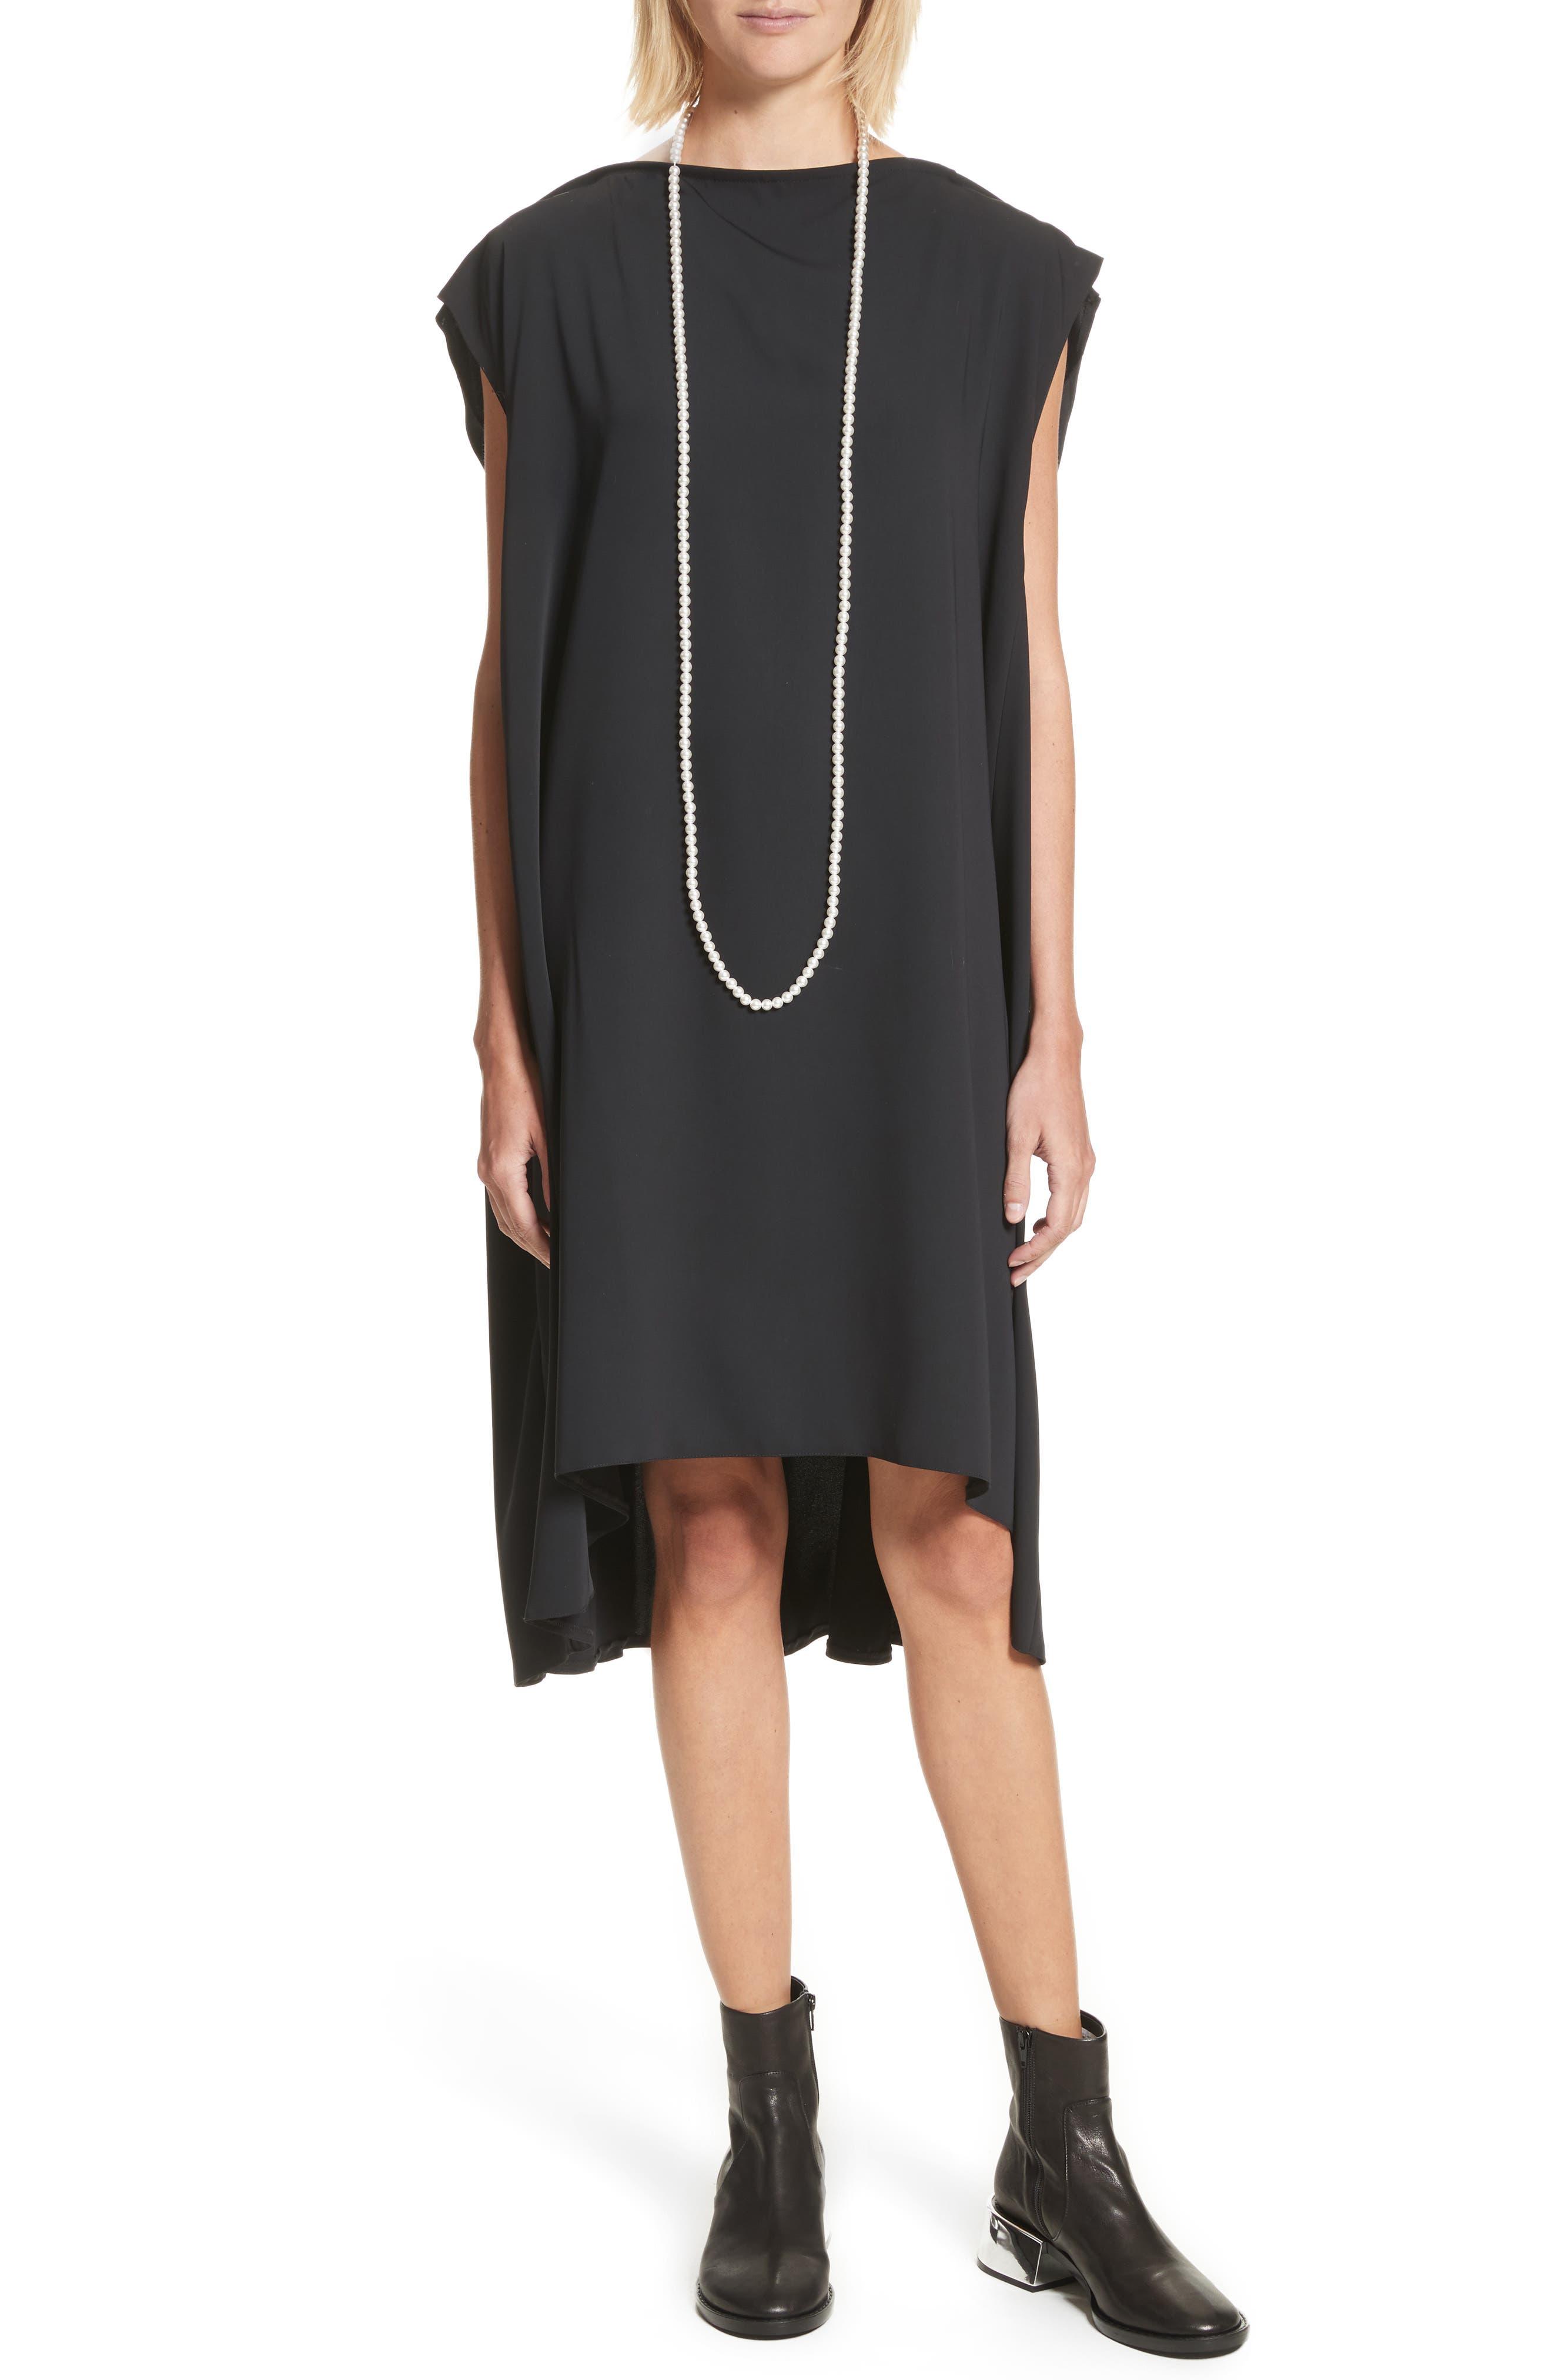 MM6 Maison Margiela Imitation Pearl Belt Shift Dress